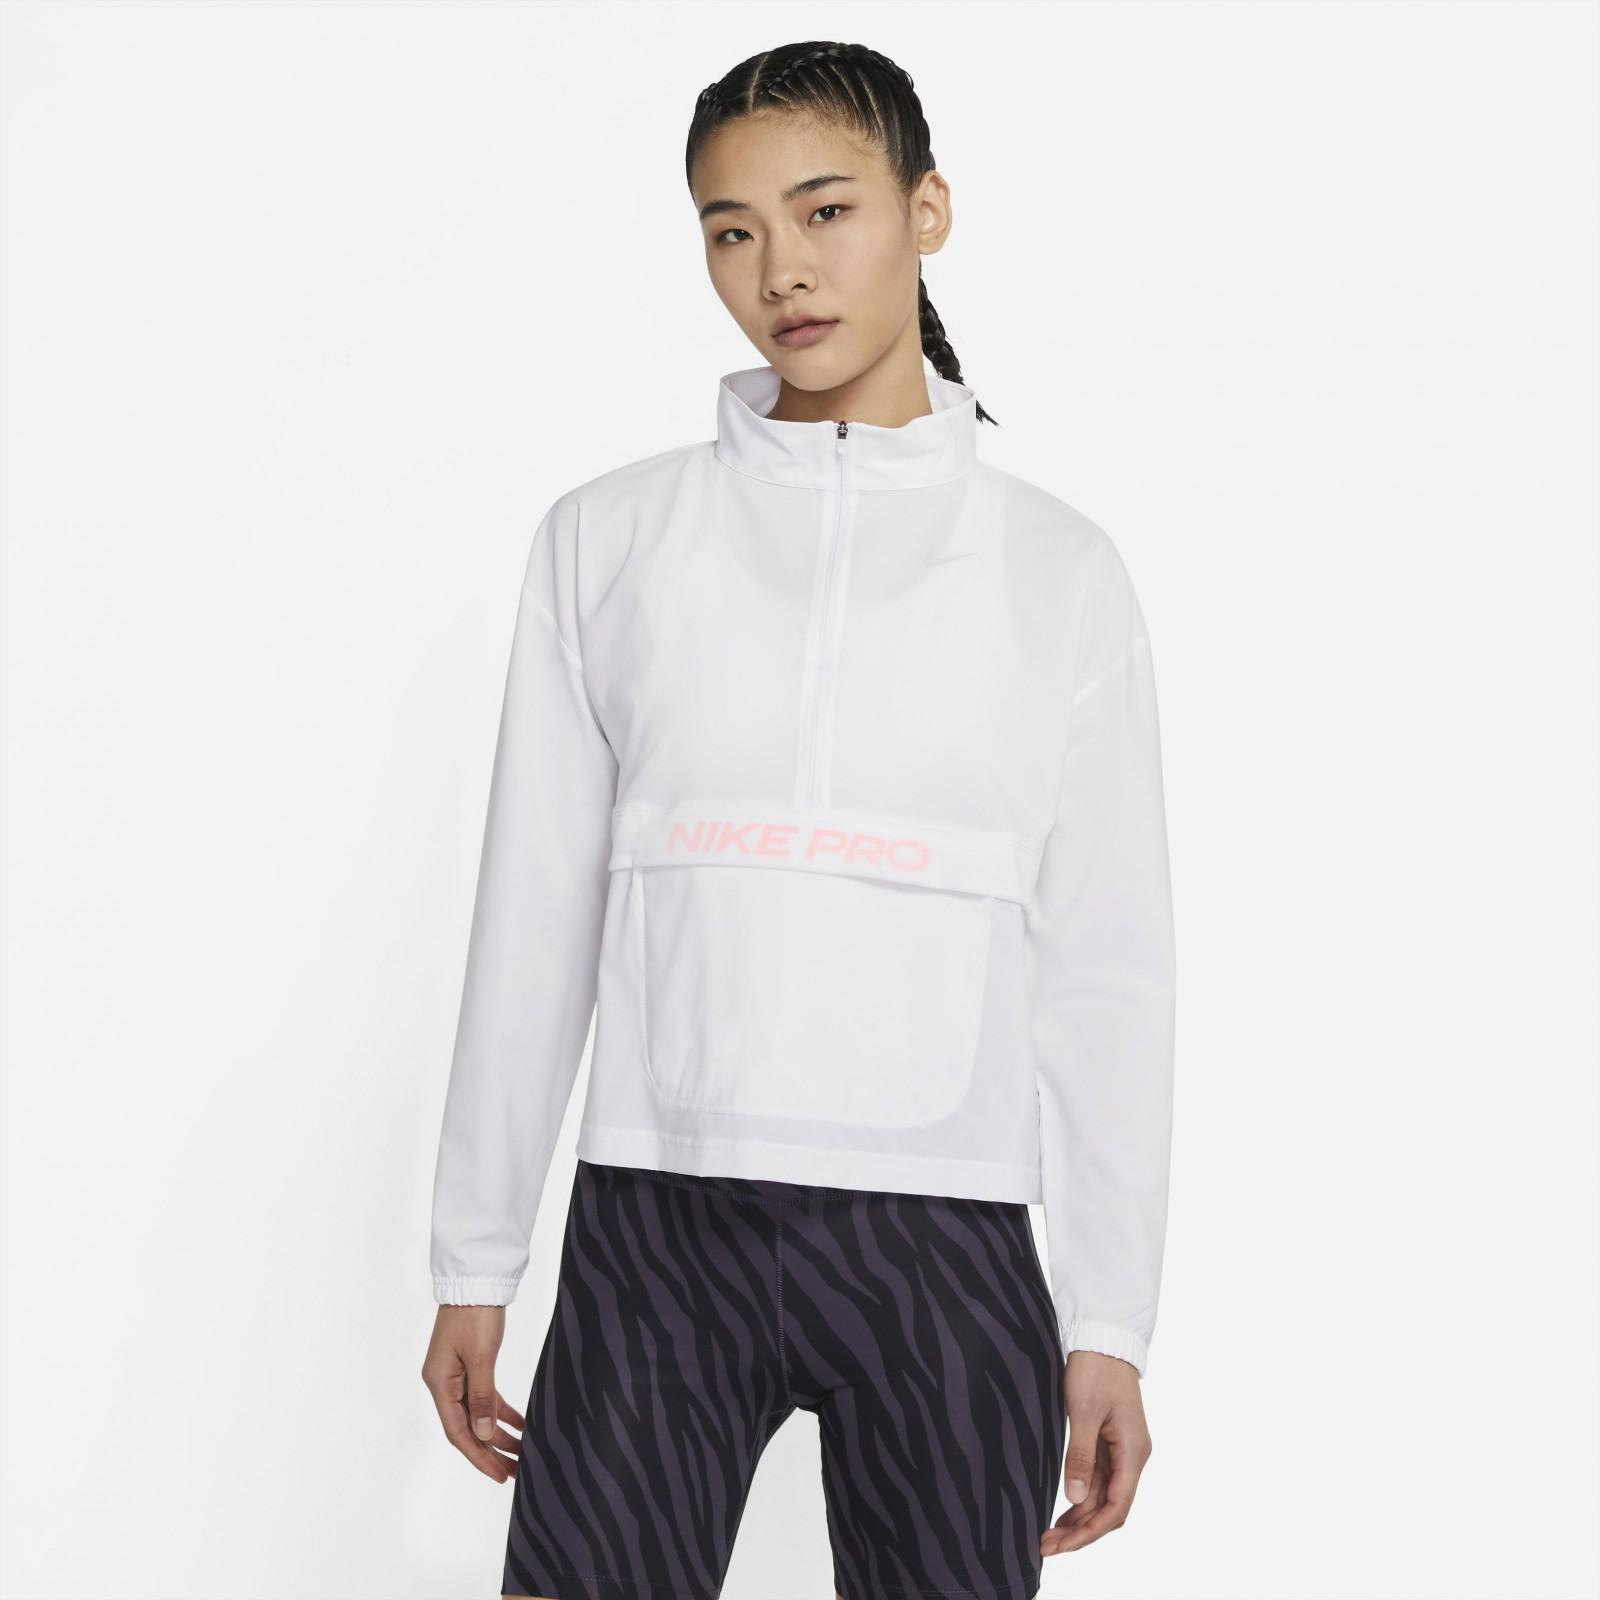 Nike Pro Woven WHITE/PURE PLATINUM